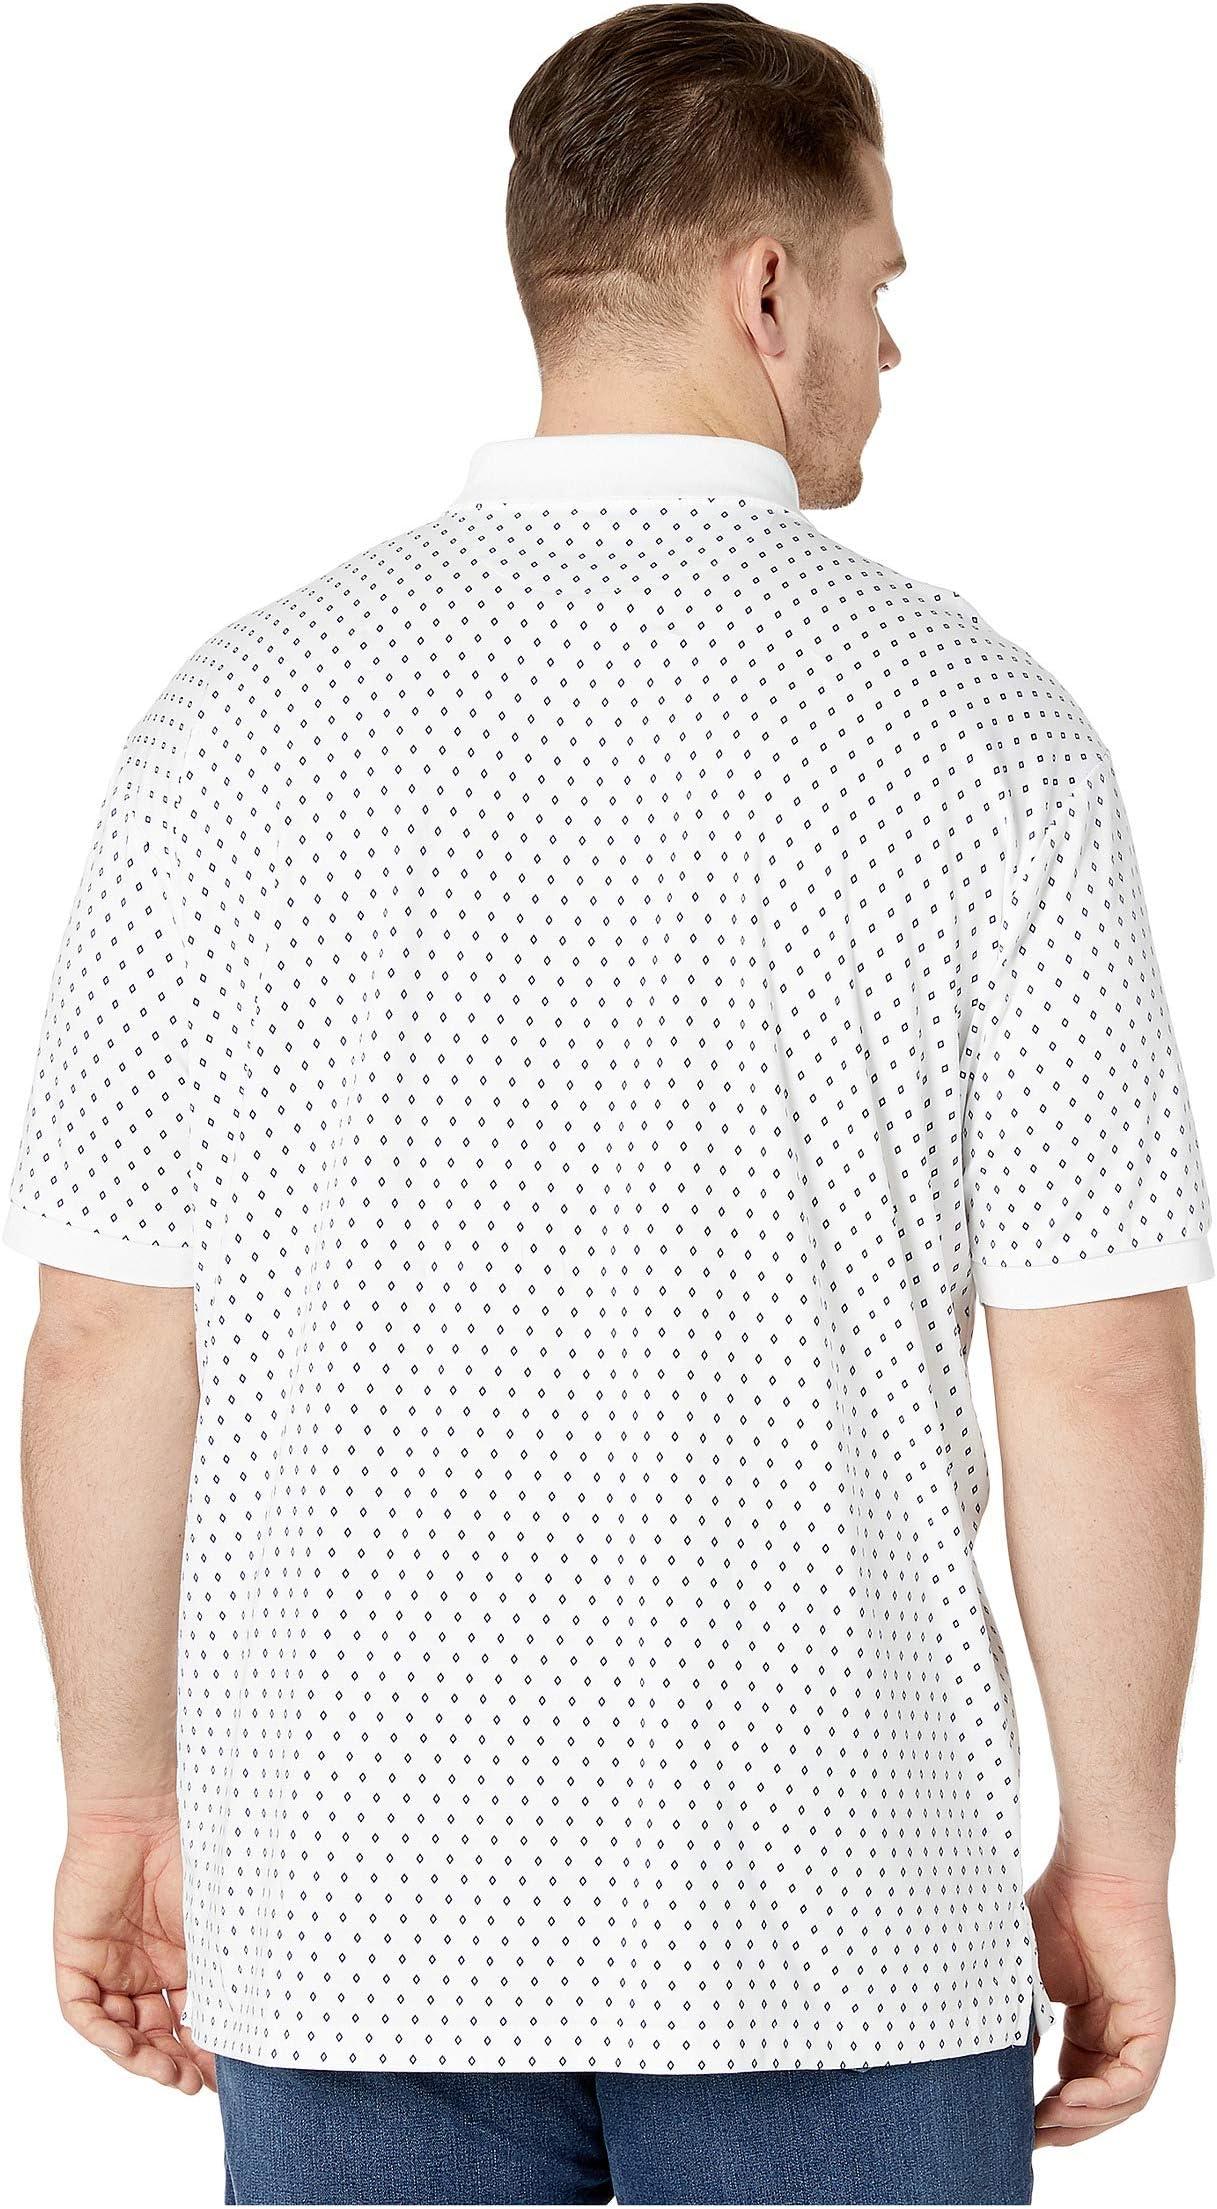 Polo Ralph Lauren Big & Tall Big & Tall Short Sleeve Soft Touch Polo Orn6U